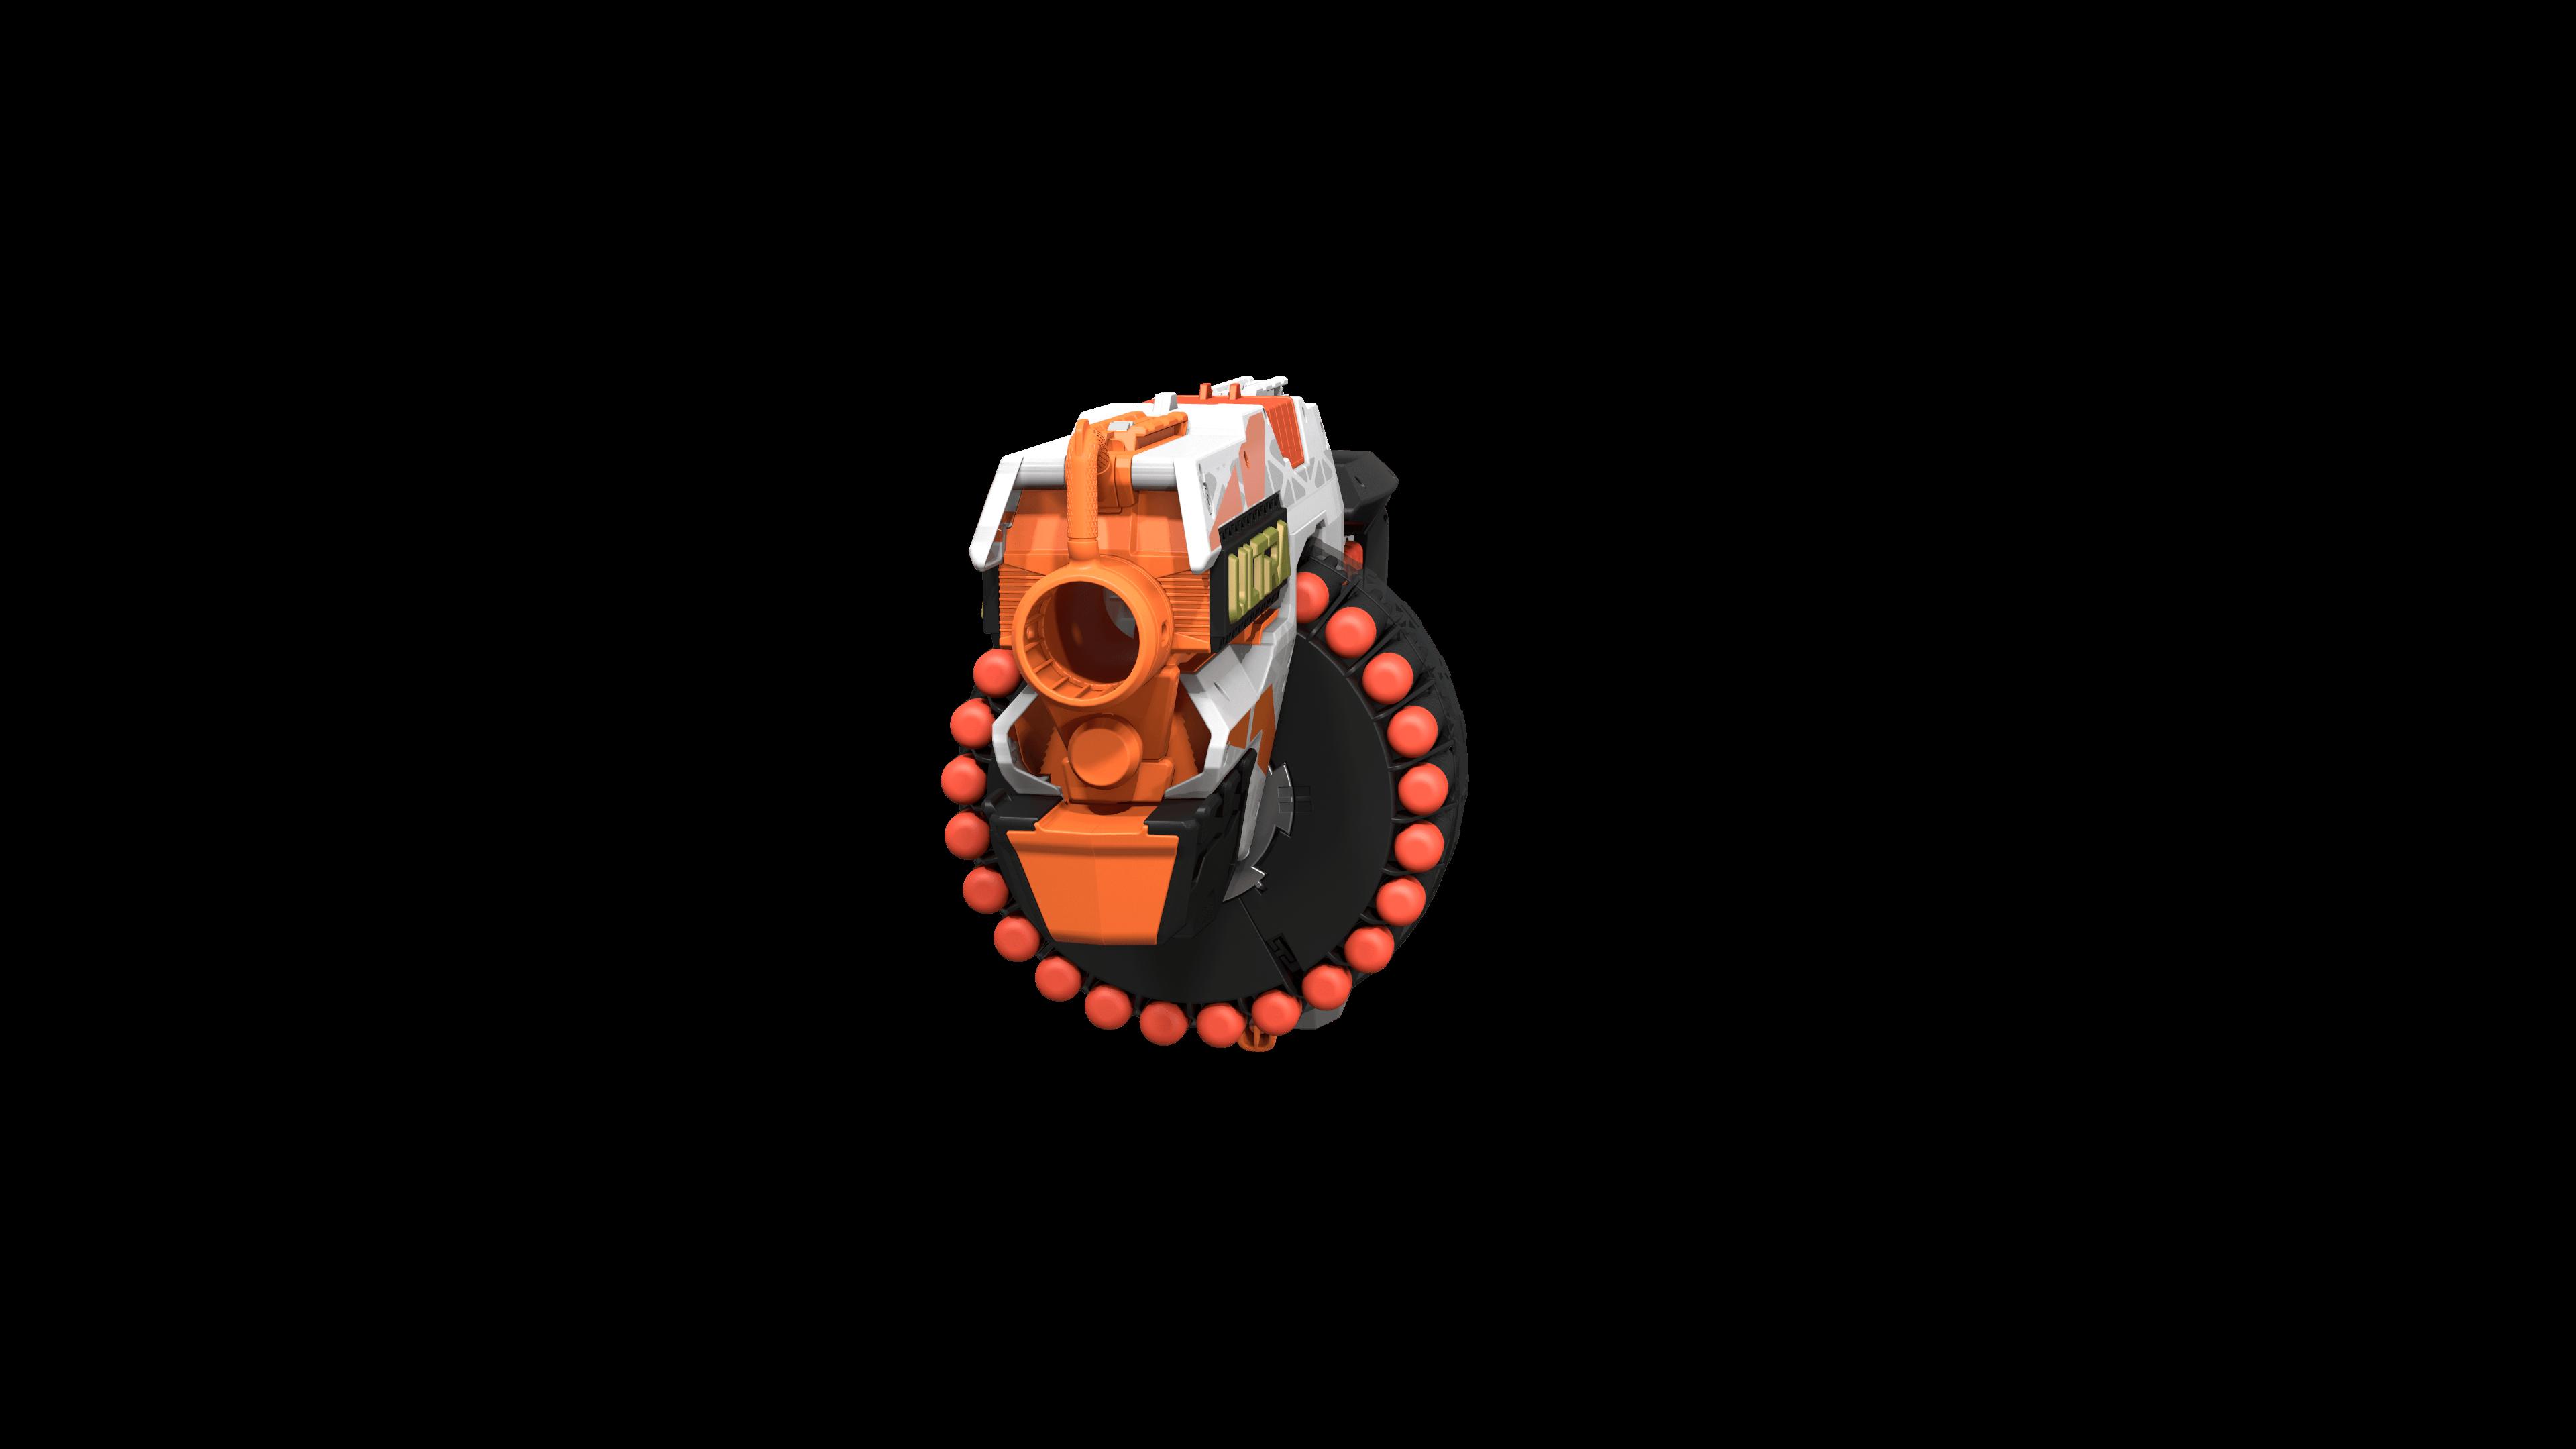 ultra blaster img 89